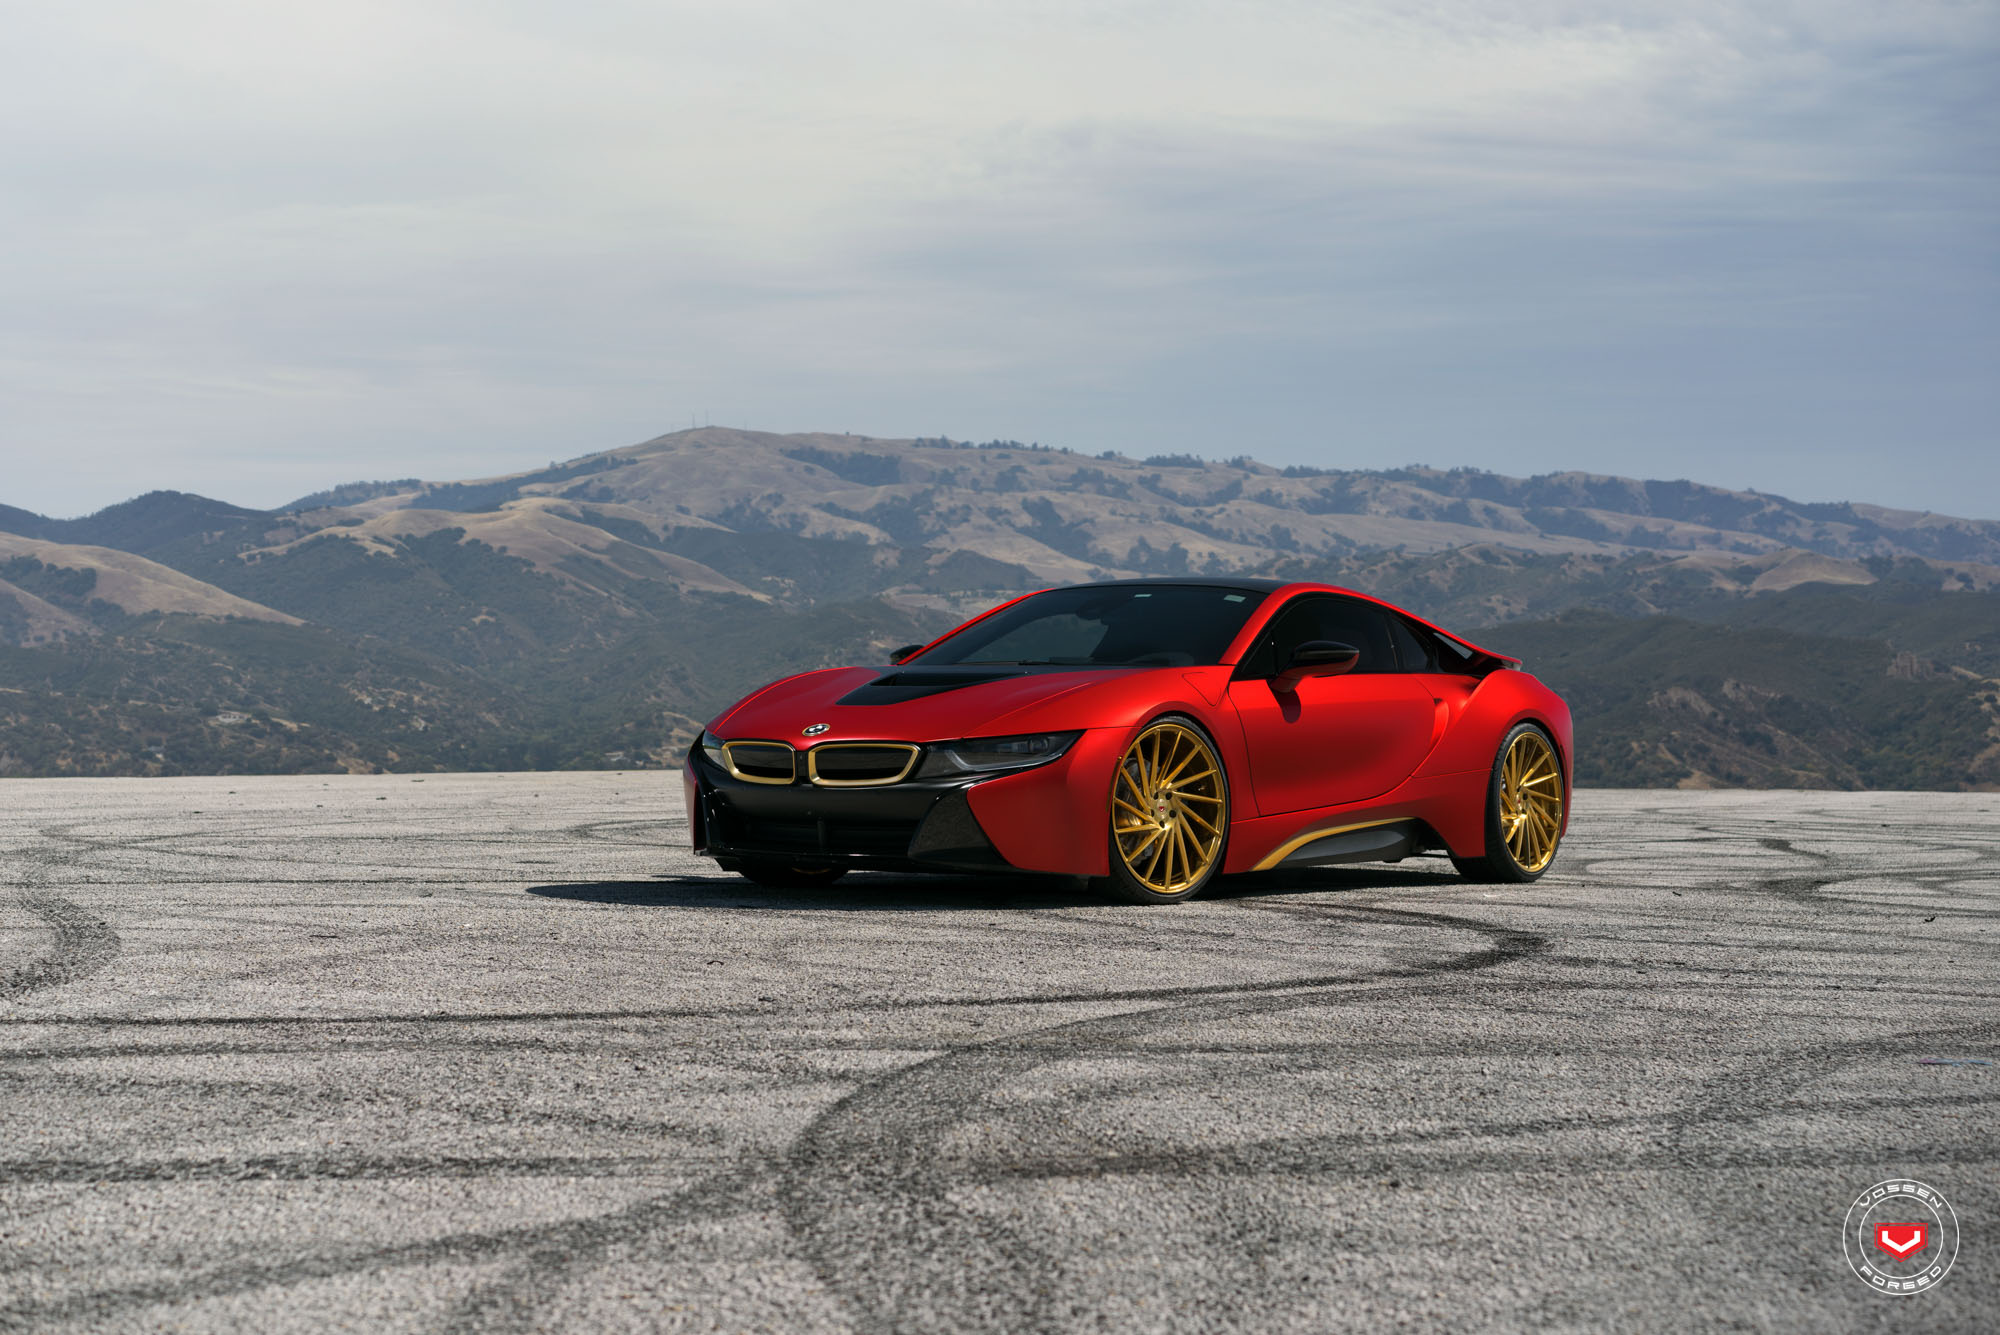 Austin Mahone S Iron Man Bmw I8 Makes More Sense Than The Audi R8